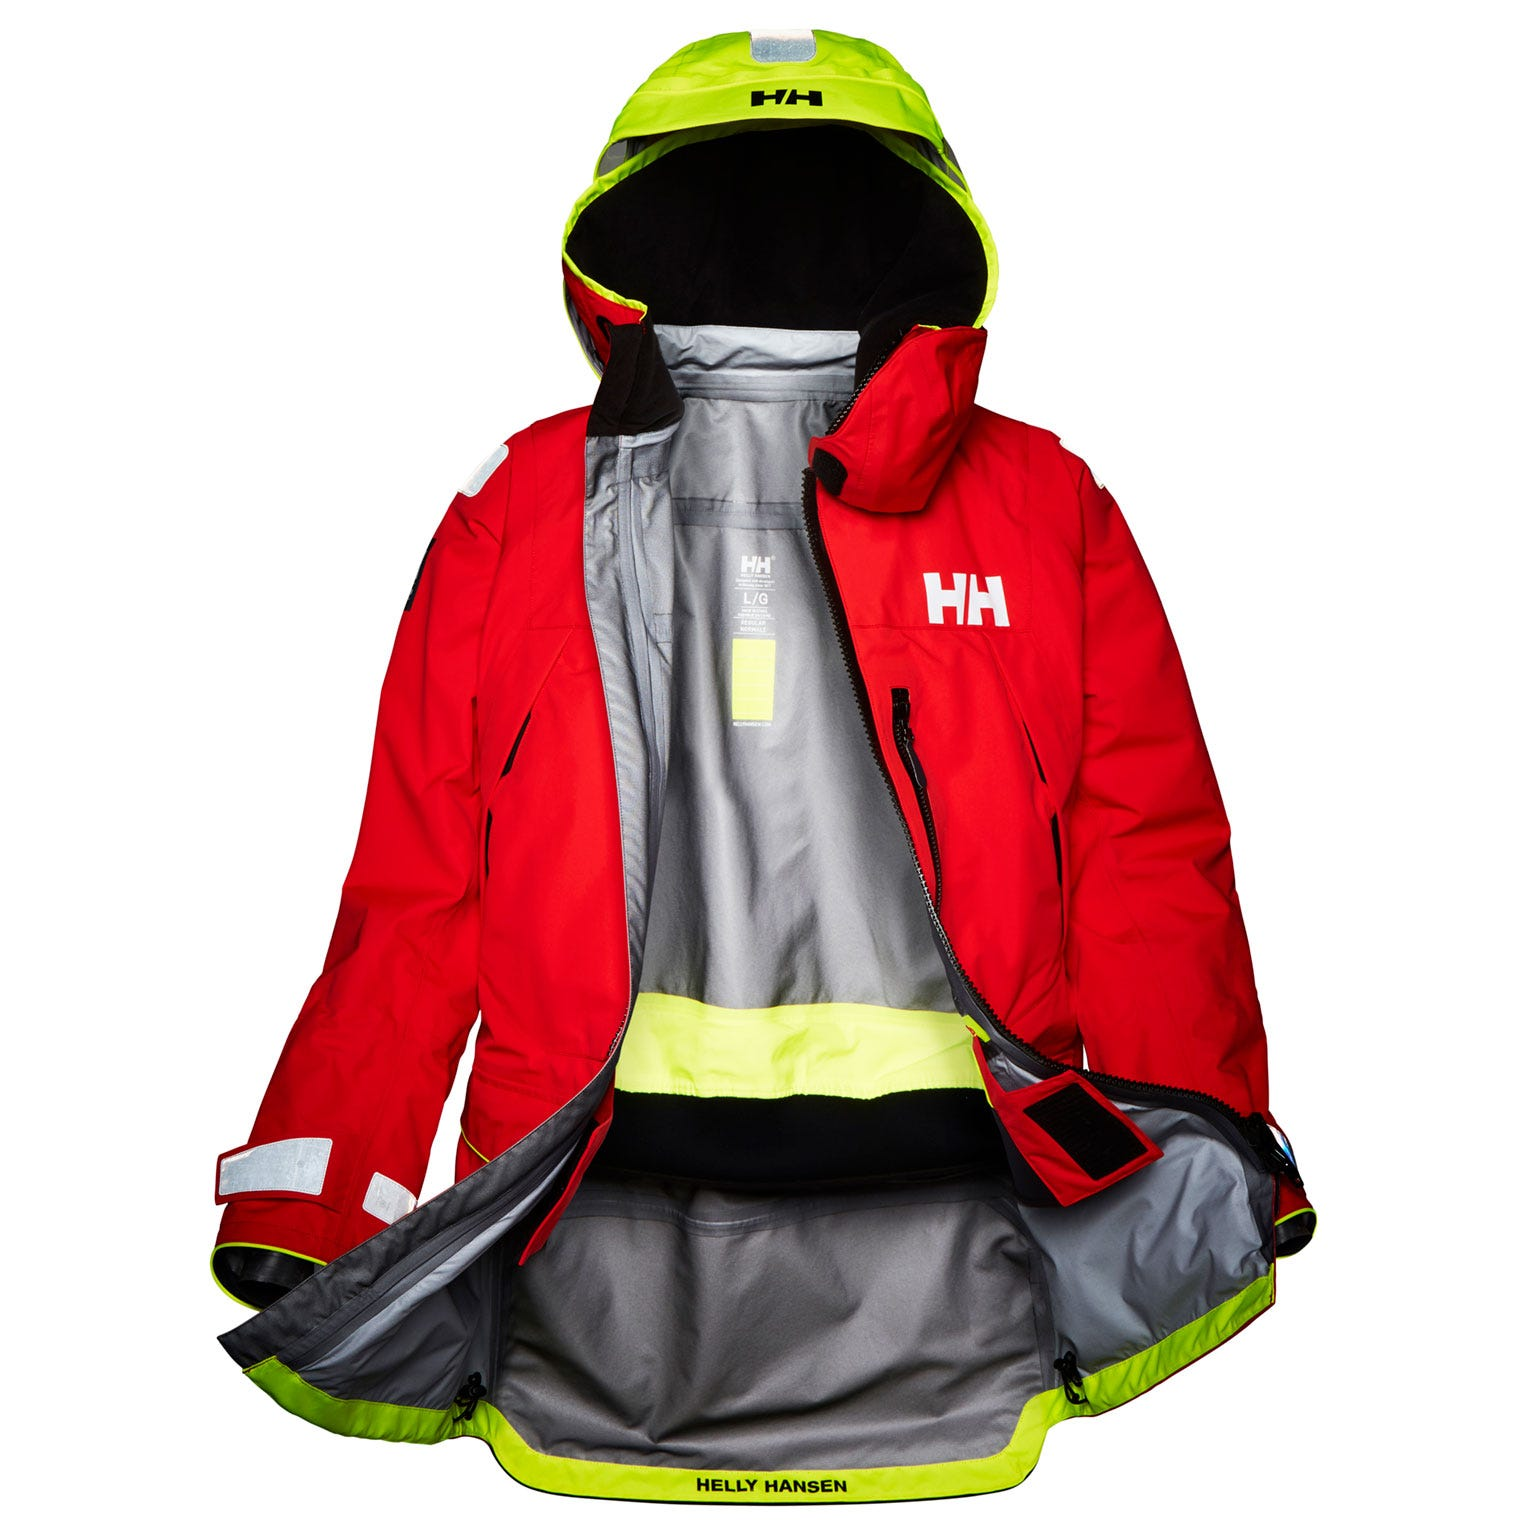 Helly Hansen Mens Aegir Ocean Sailing Jacket Red XL